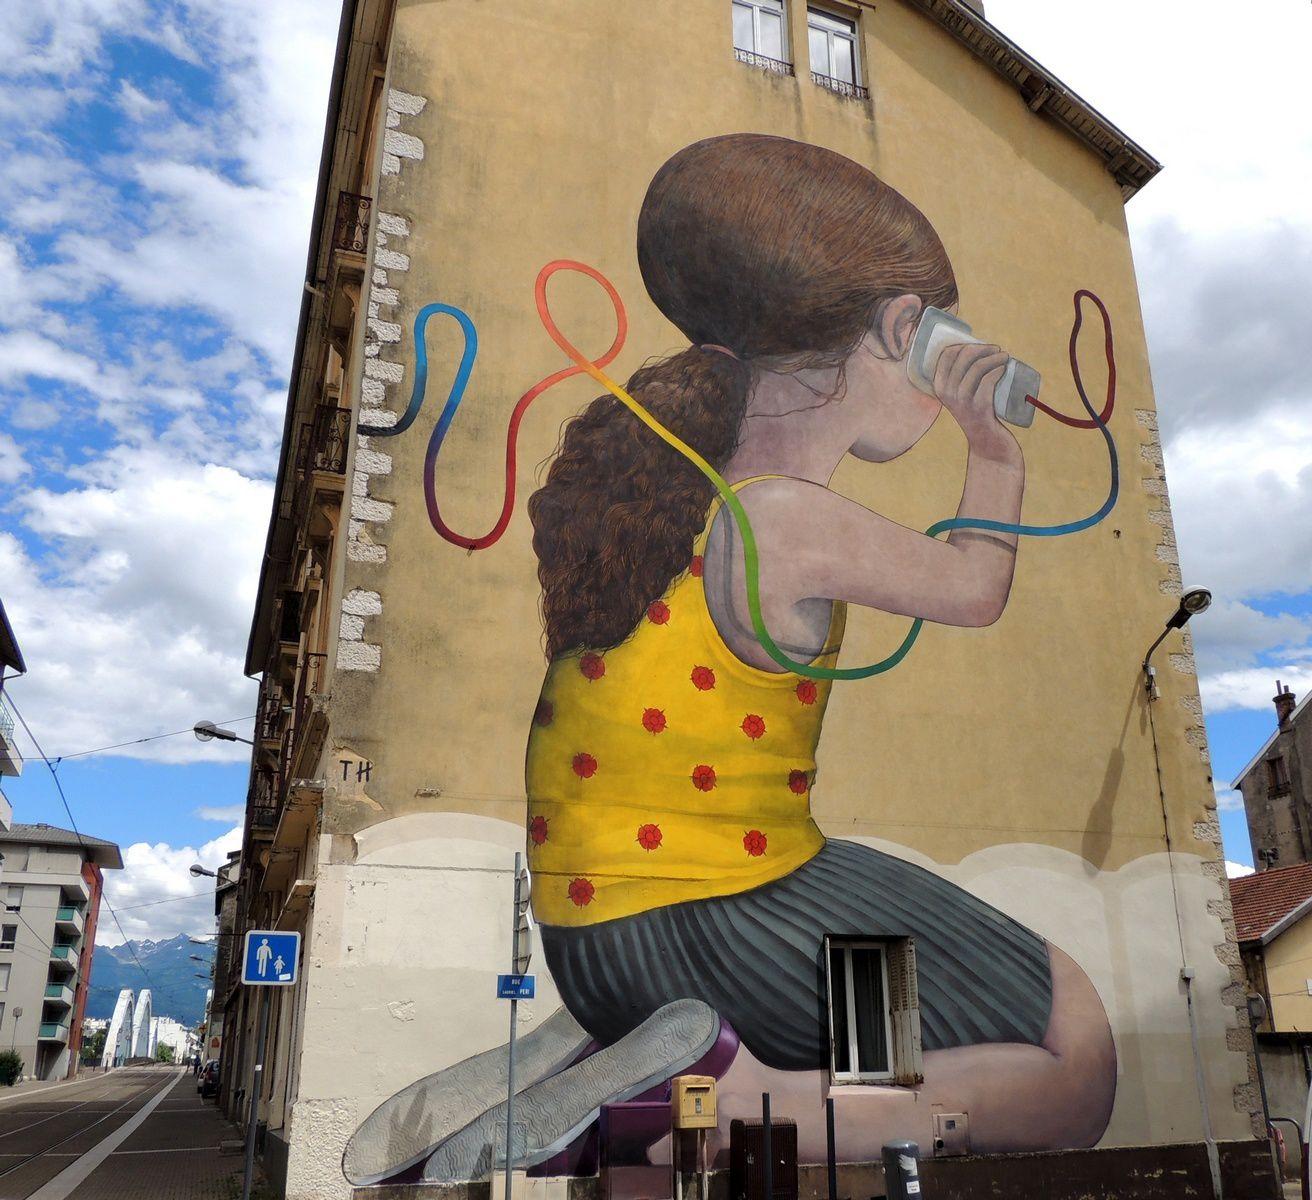 Art pour tous - it's free! - streetart